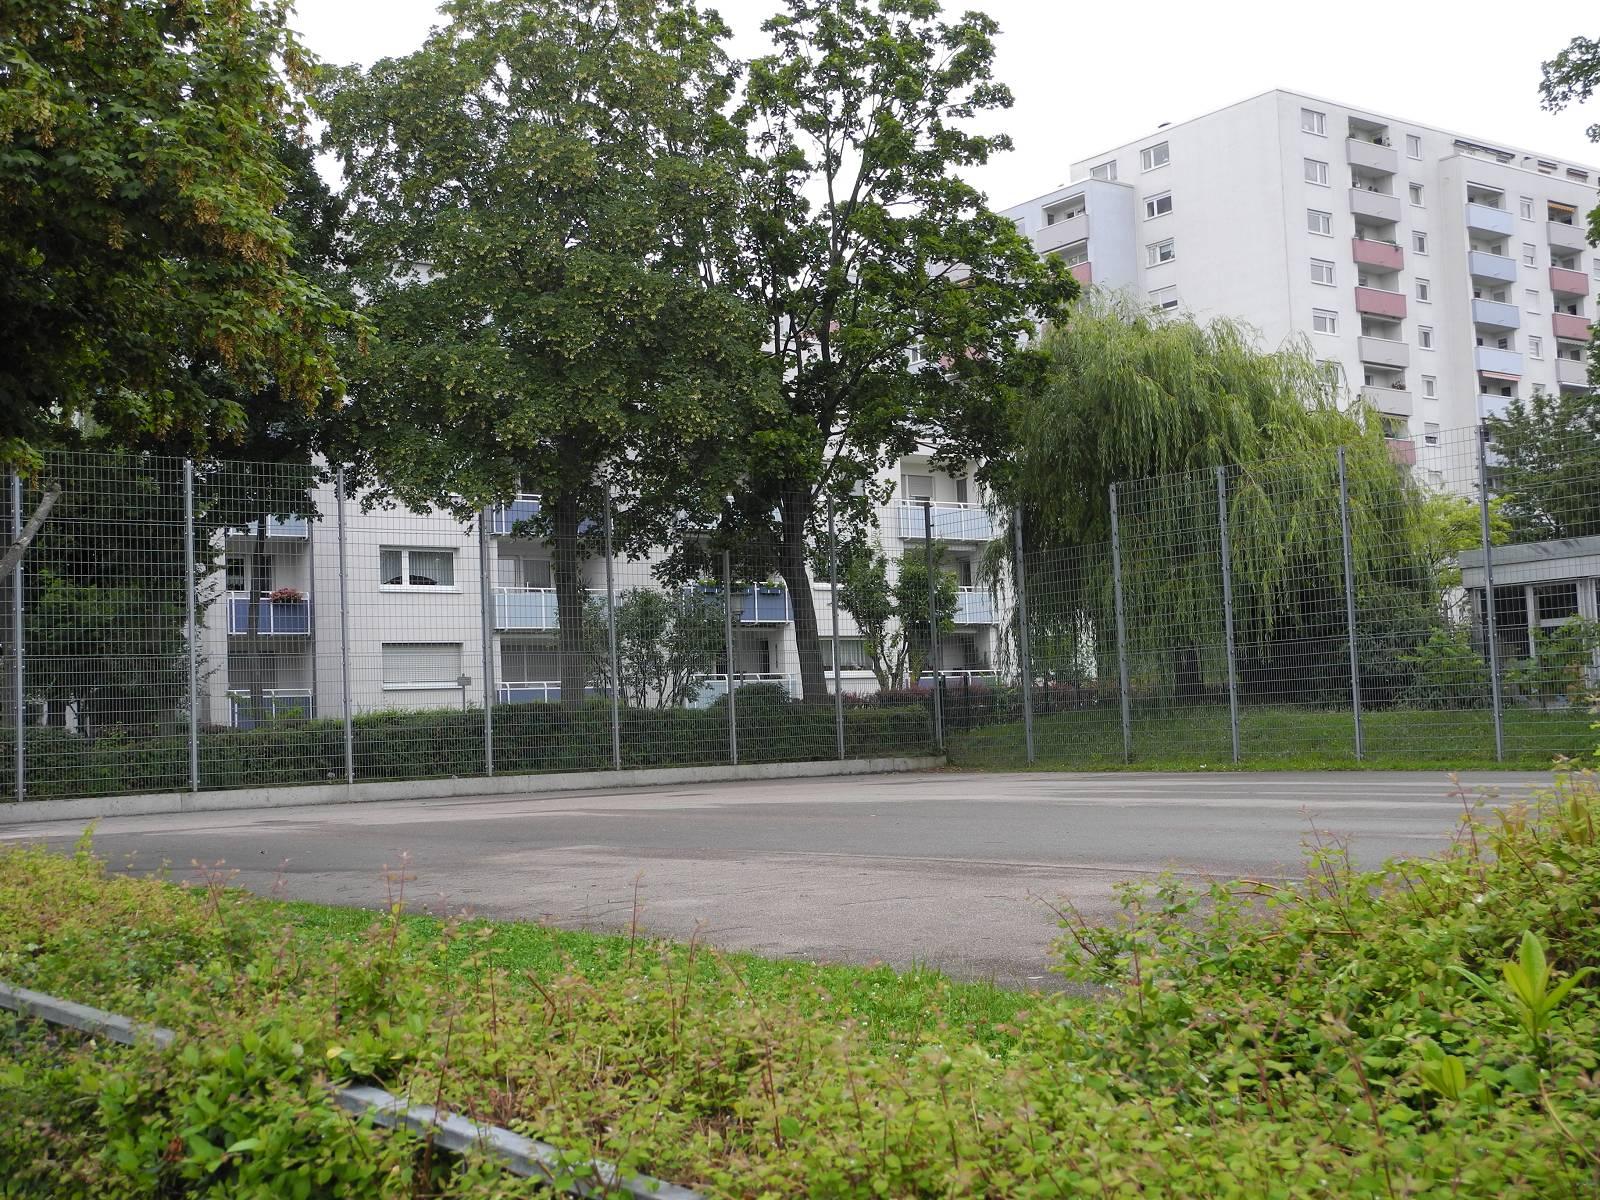 Bolzplatz Löscher